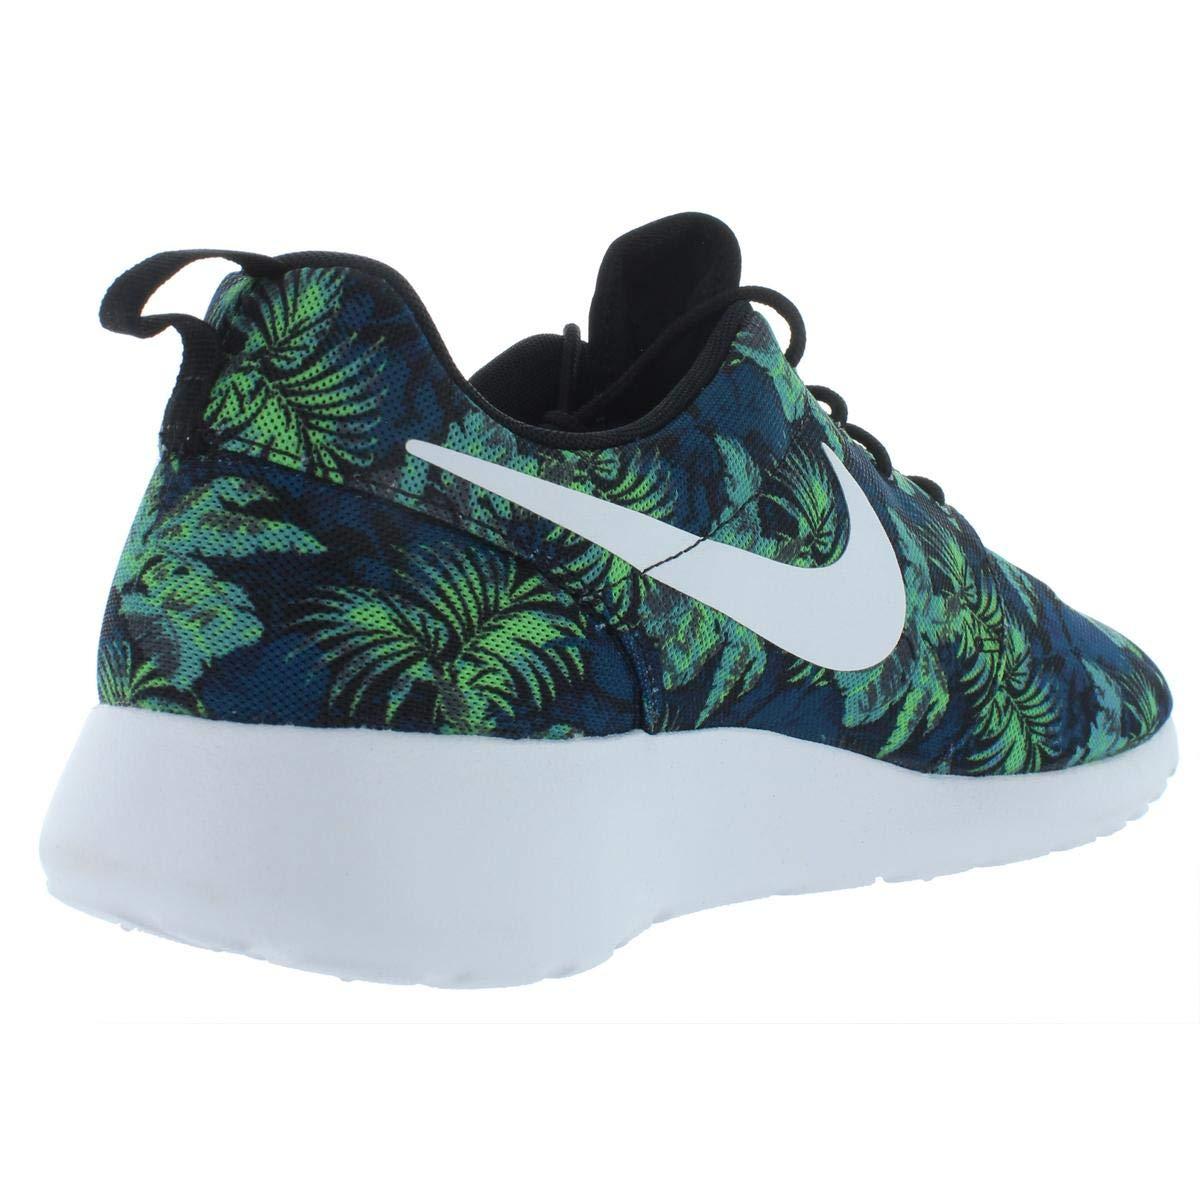 Nike Mens Roshe One Print Sneakers Low Top Running Shoes